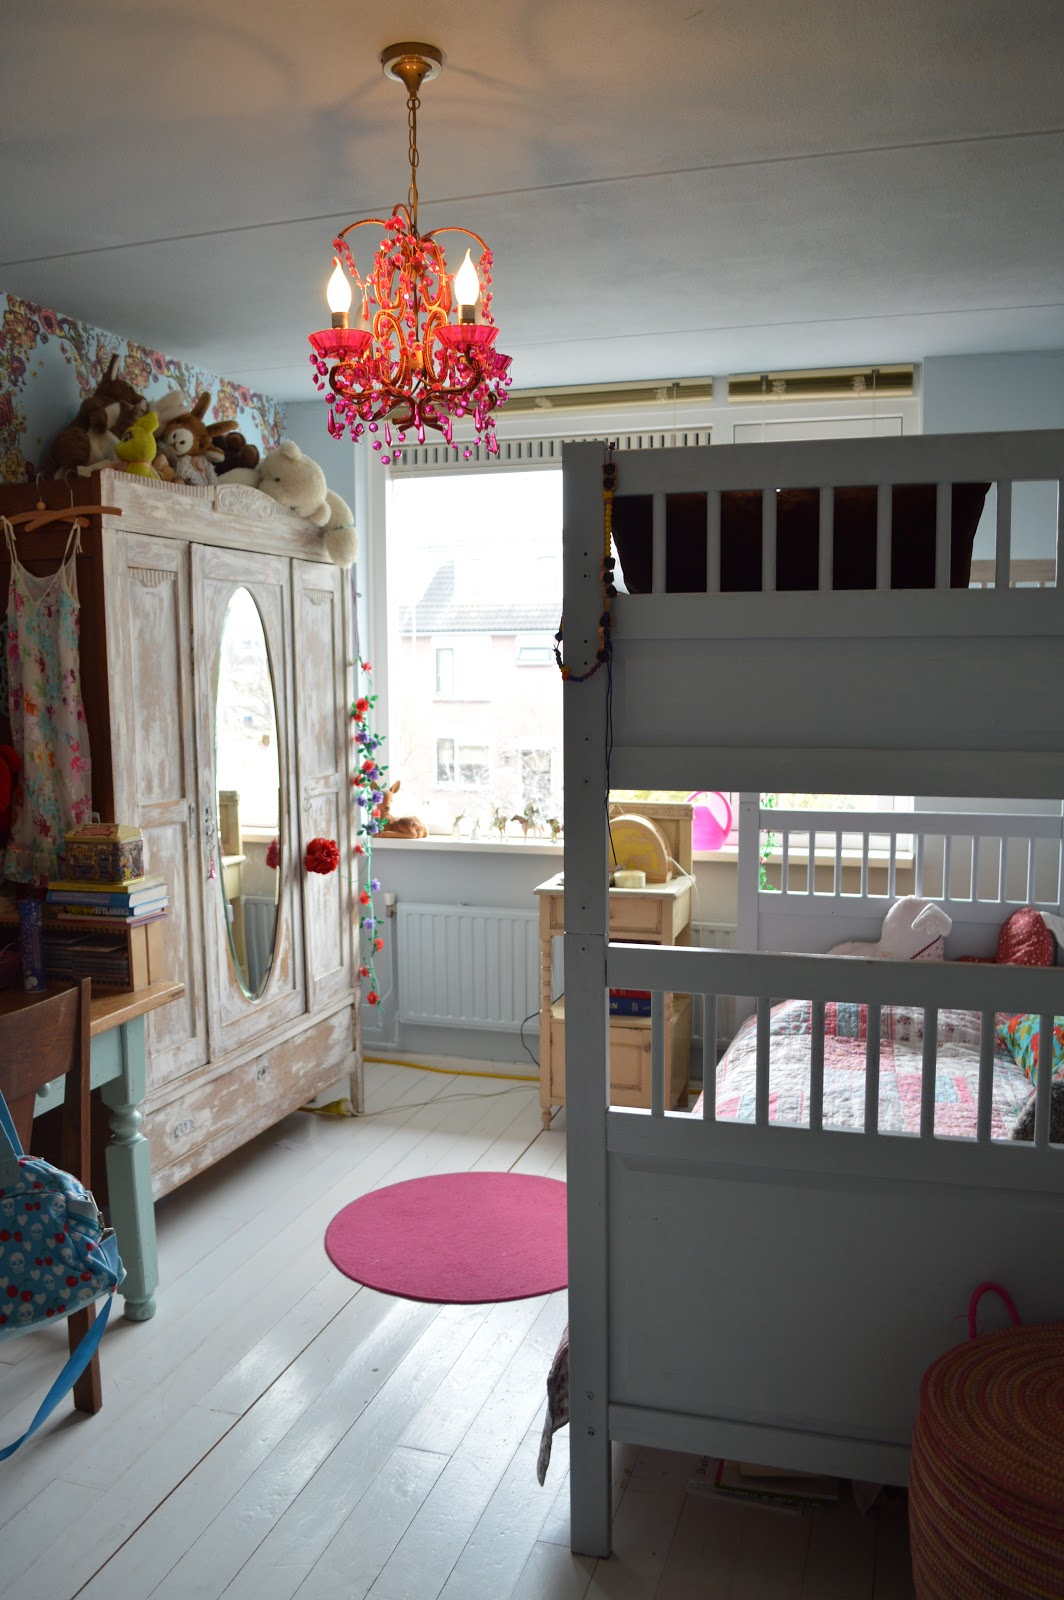 www.redcherryrodekers.blogspot.nl: Girls room #oldroom 2